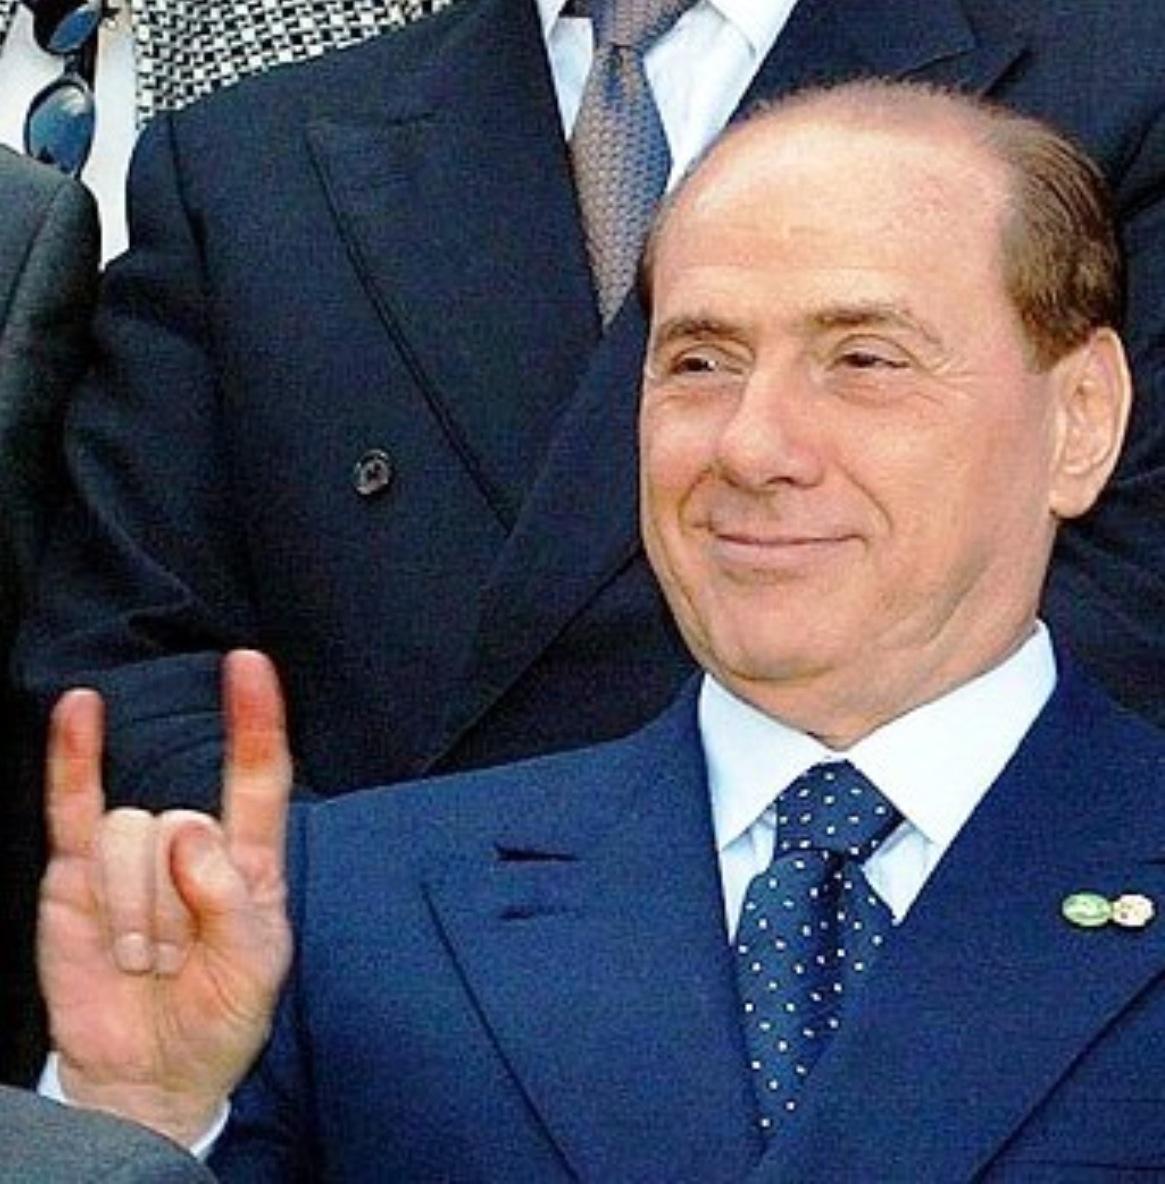 https://i1.wp.com/www.giornalettismo.com/wp-content/uploads/2012/12/scandali-di-berlusconi26.jpg